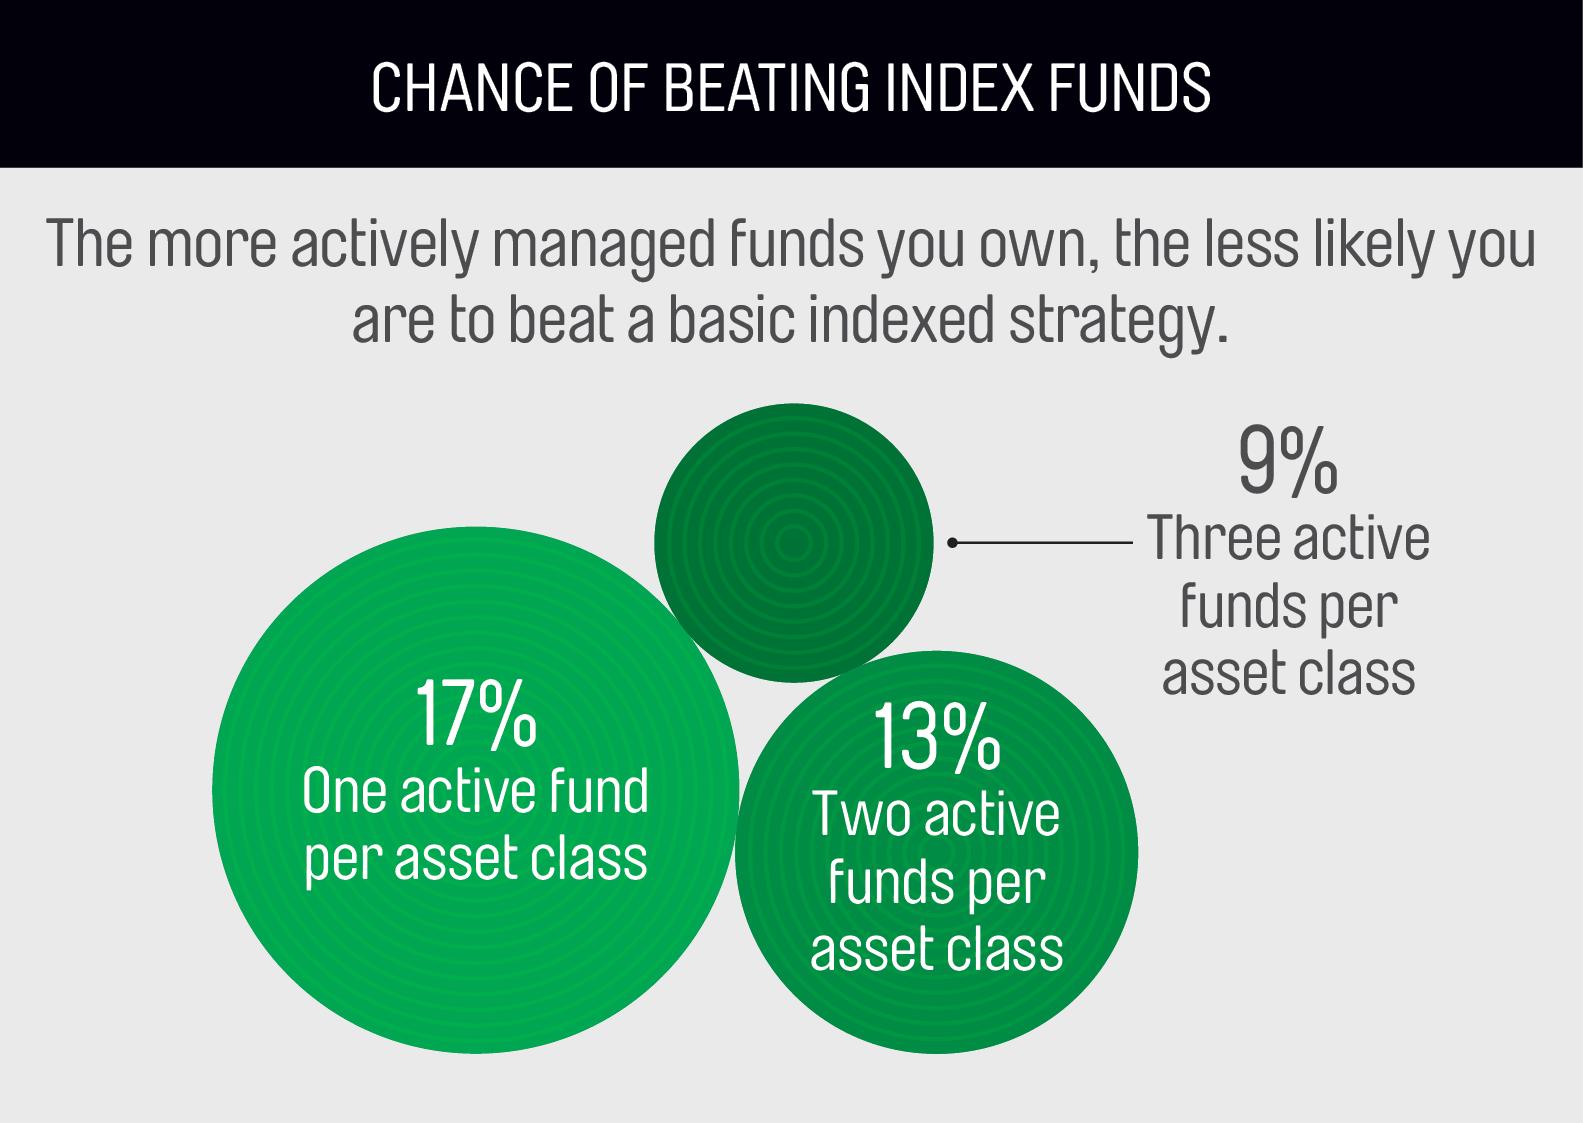 Graphic source: Richard Ferri and Alex Benke, €œA Case for Index Fund Portfolios€